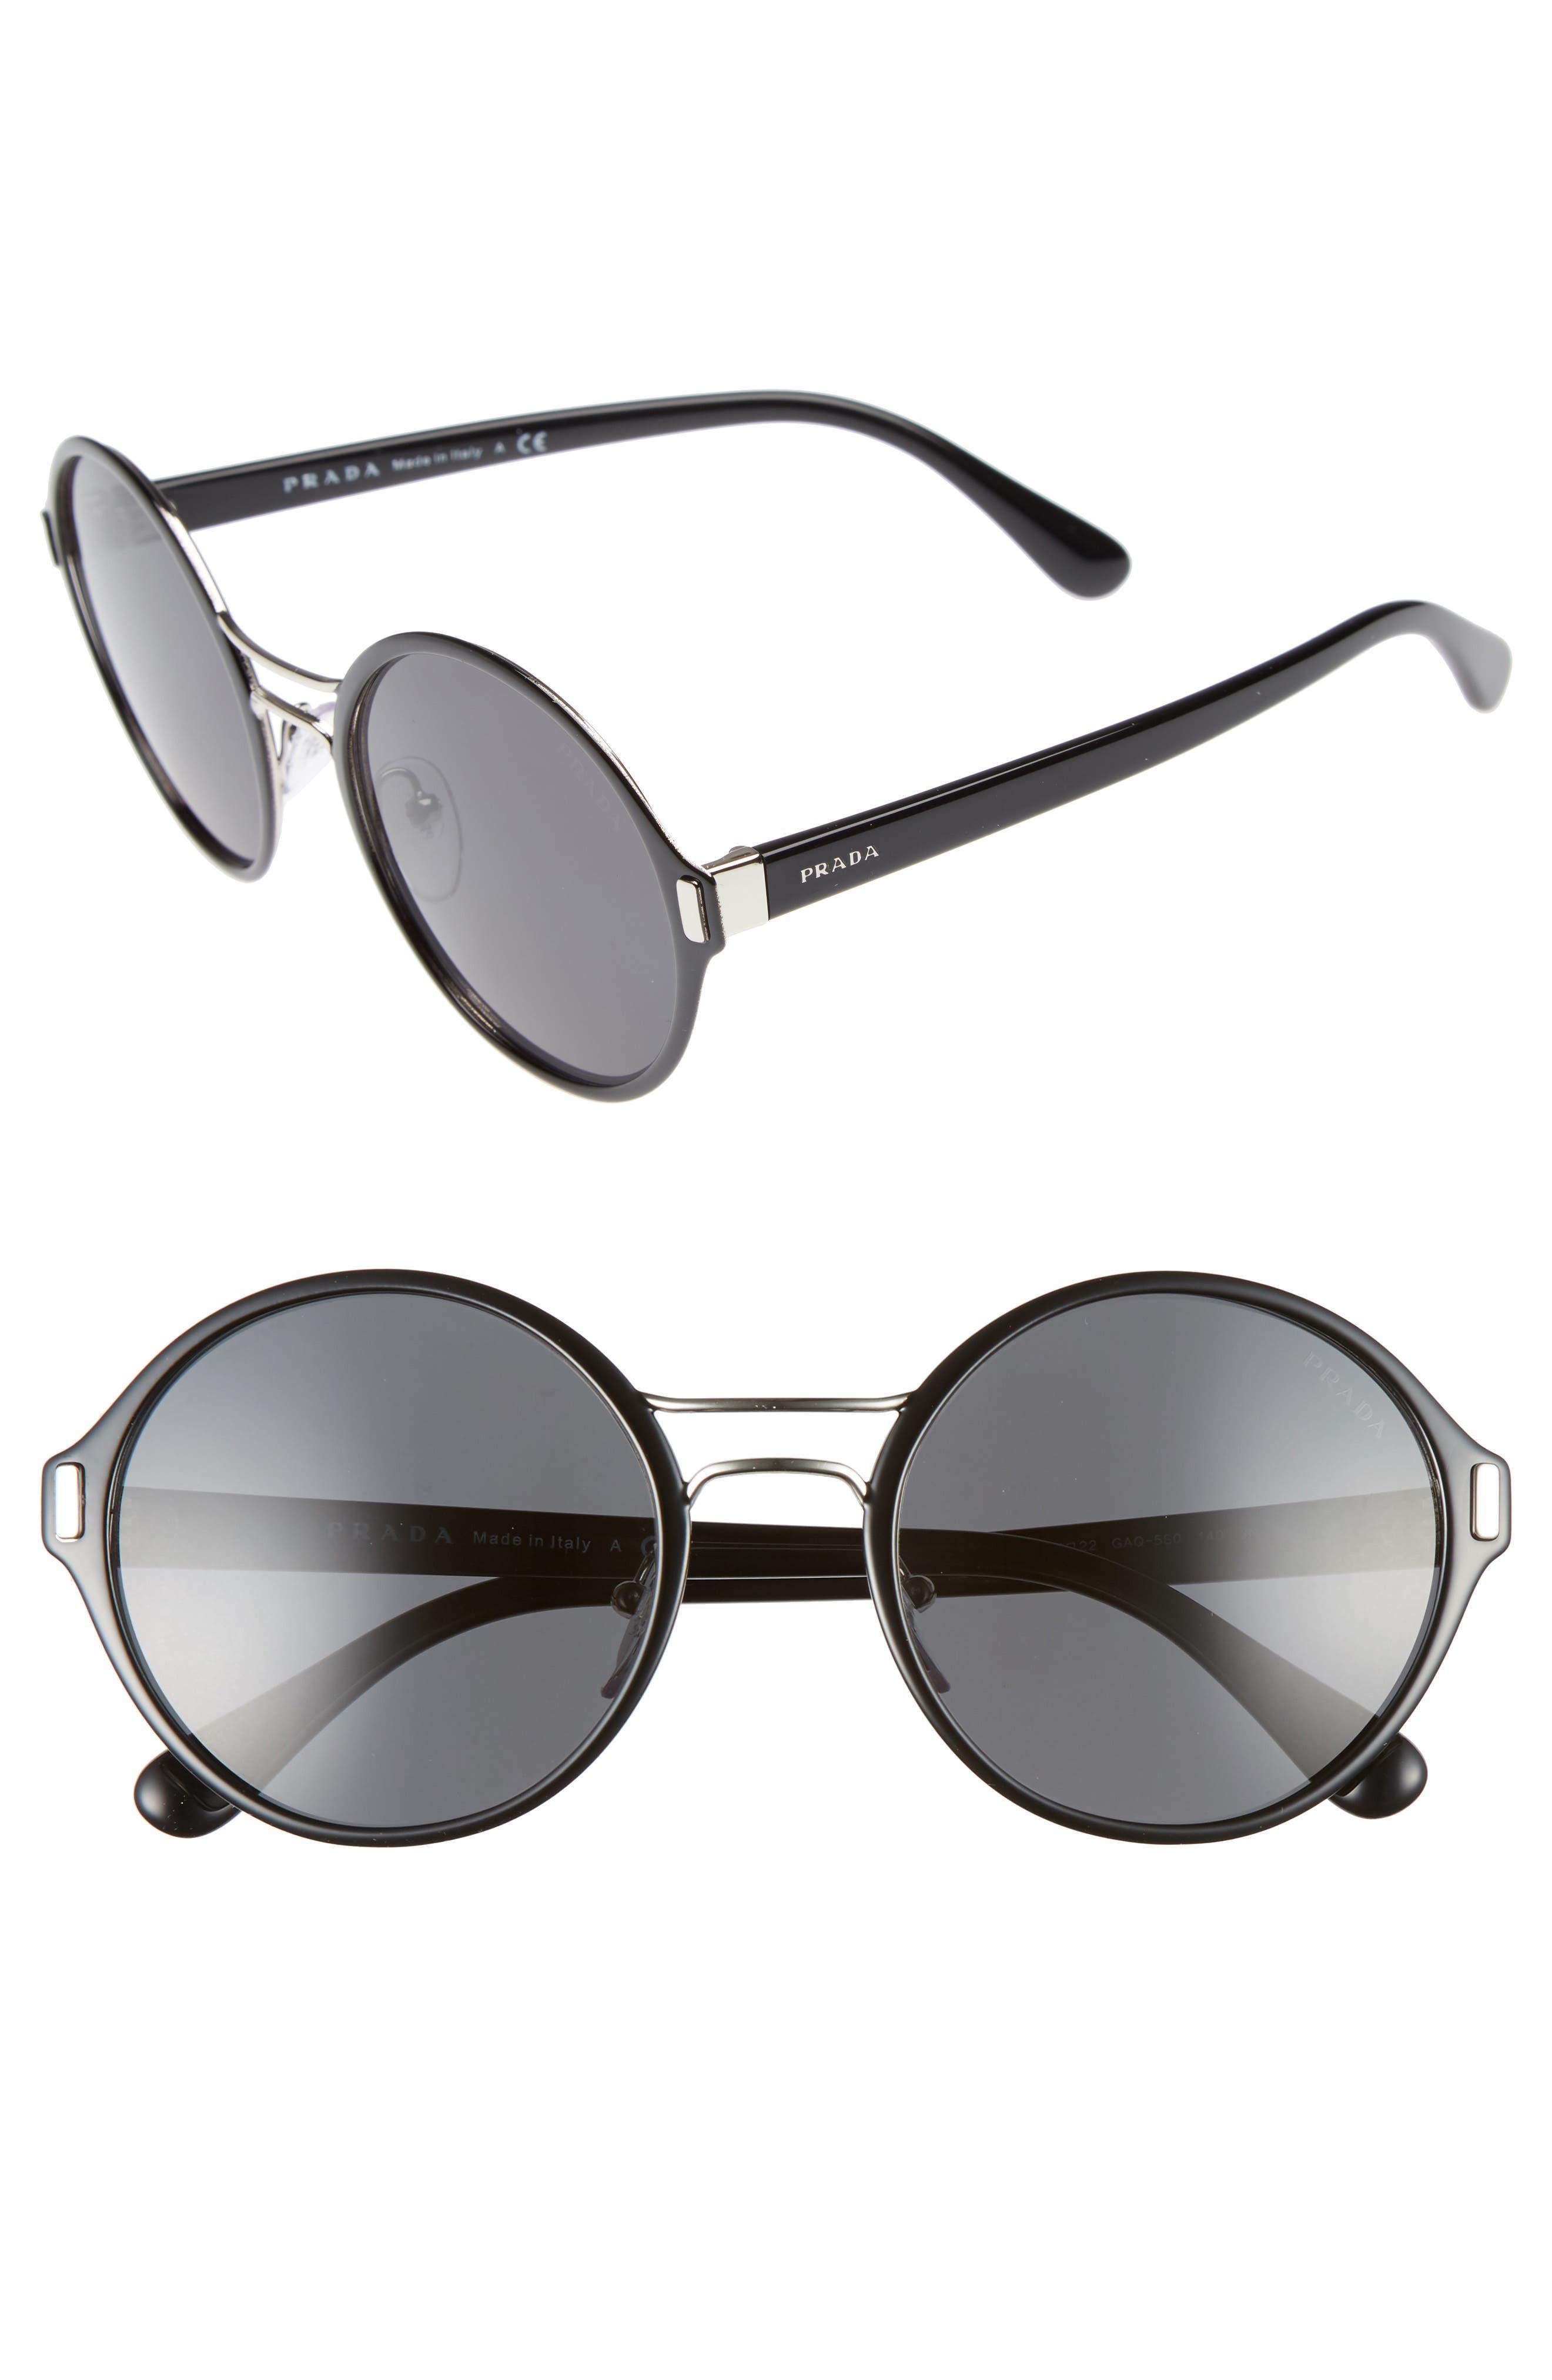 54mm Round Sunglasses,                             Main thumbnail 1, color,                             Black